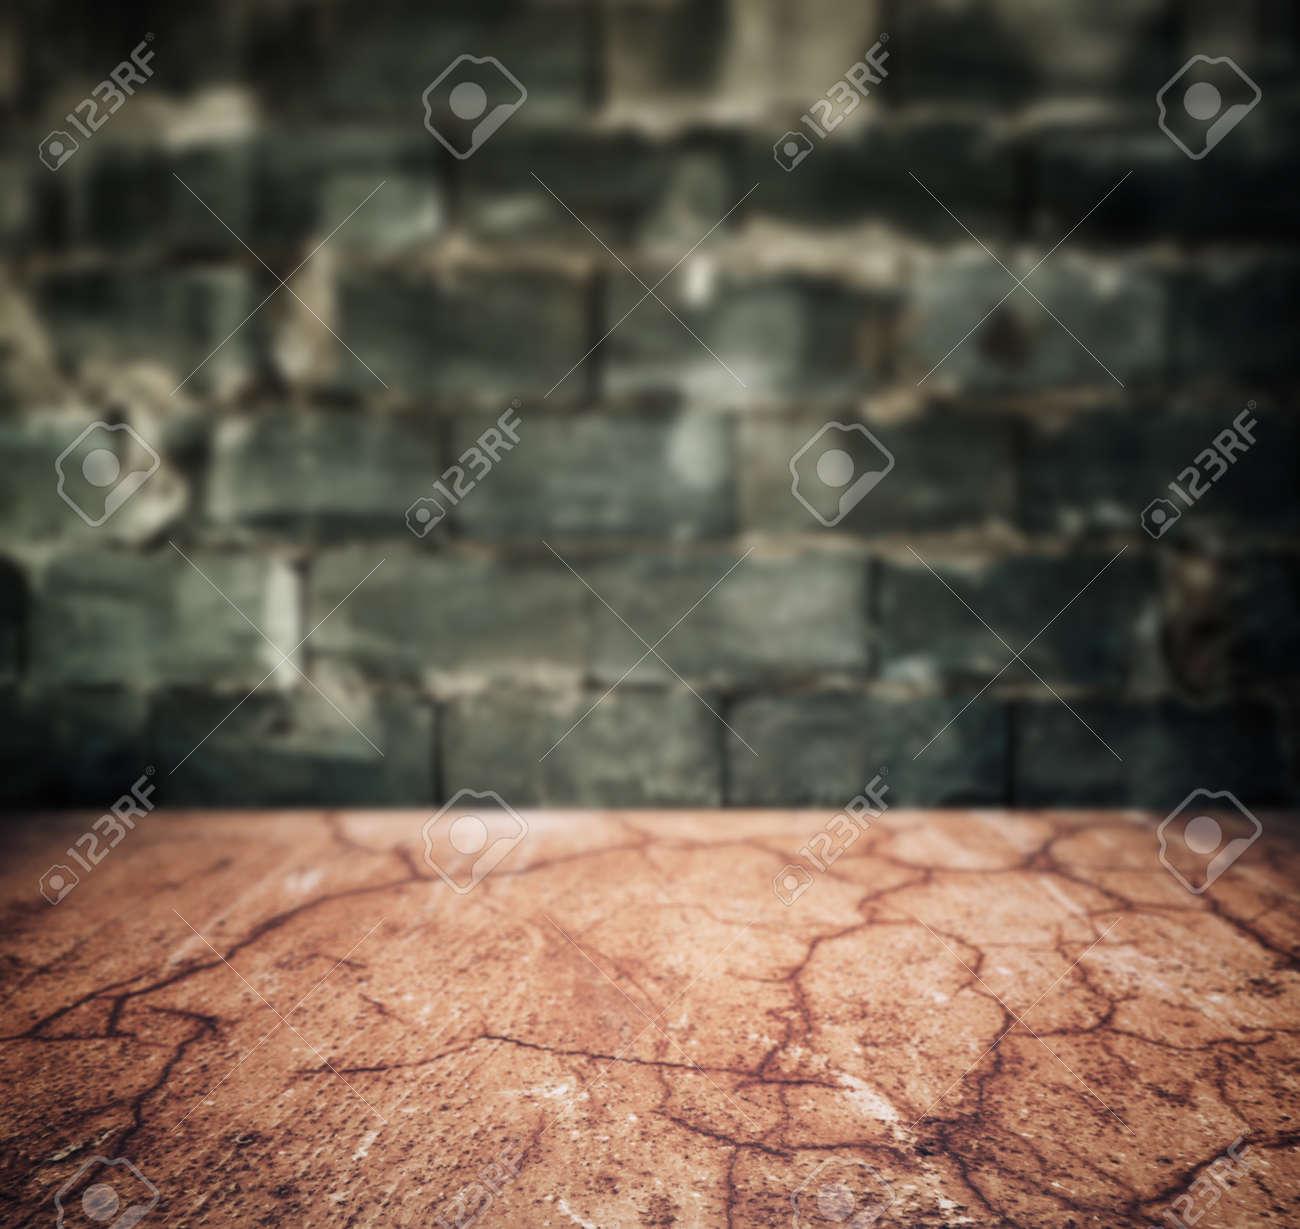 grunge urban stone floor and brick wall interior background - 140166815